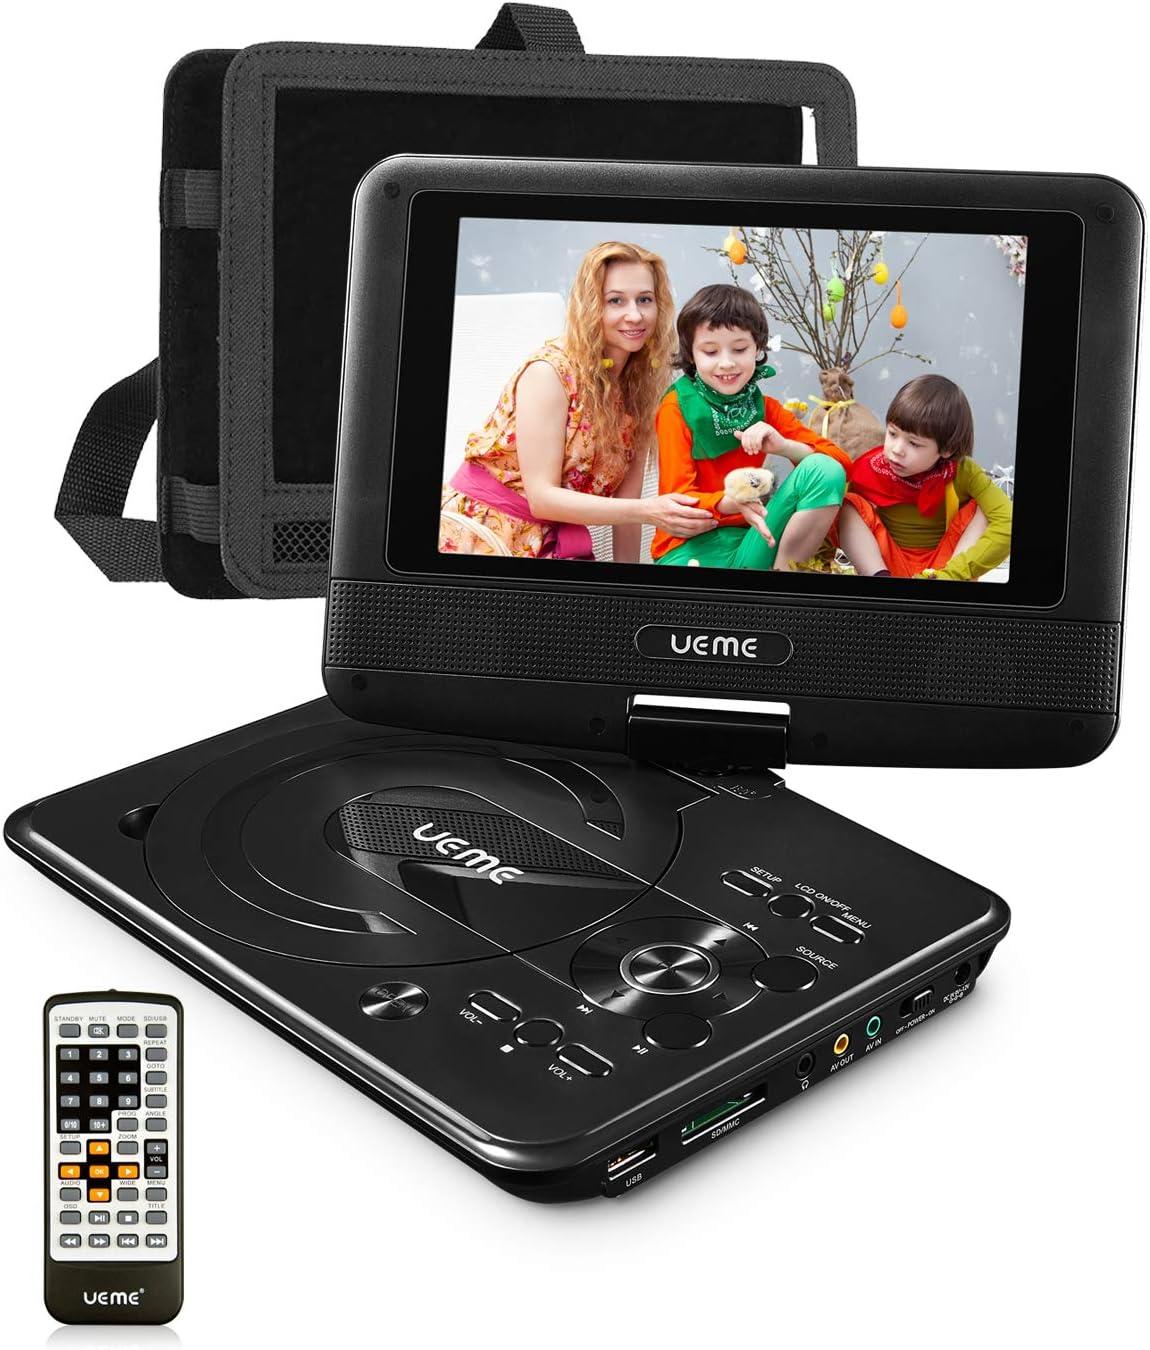 UEME Mini DVD Player